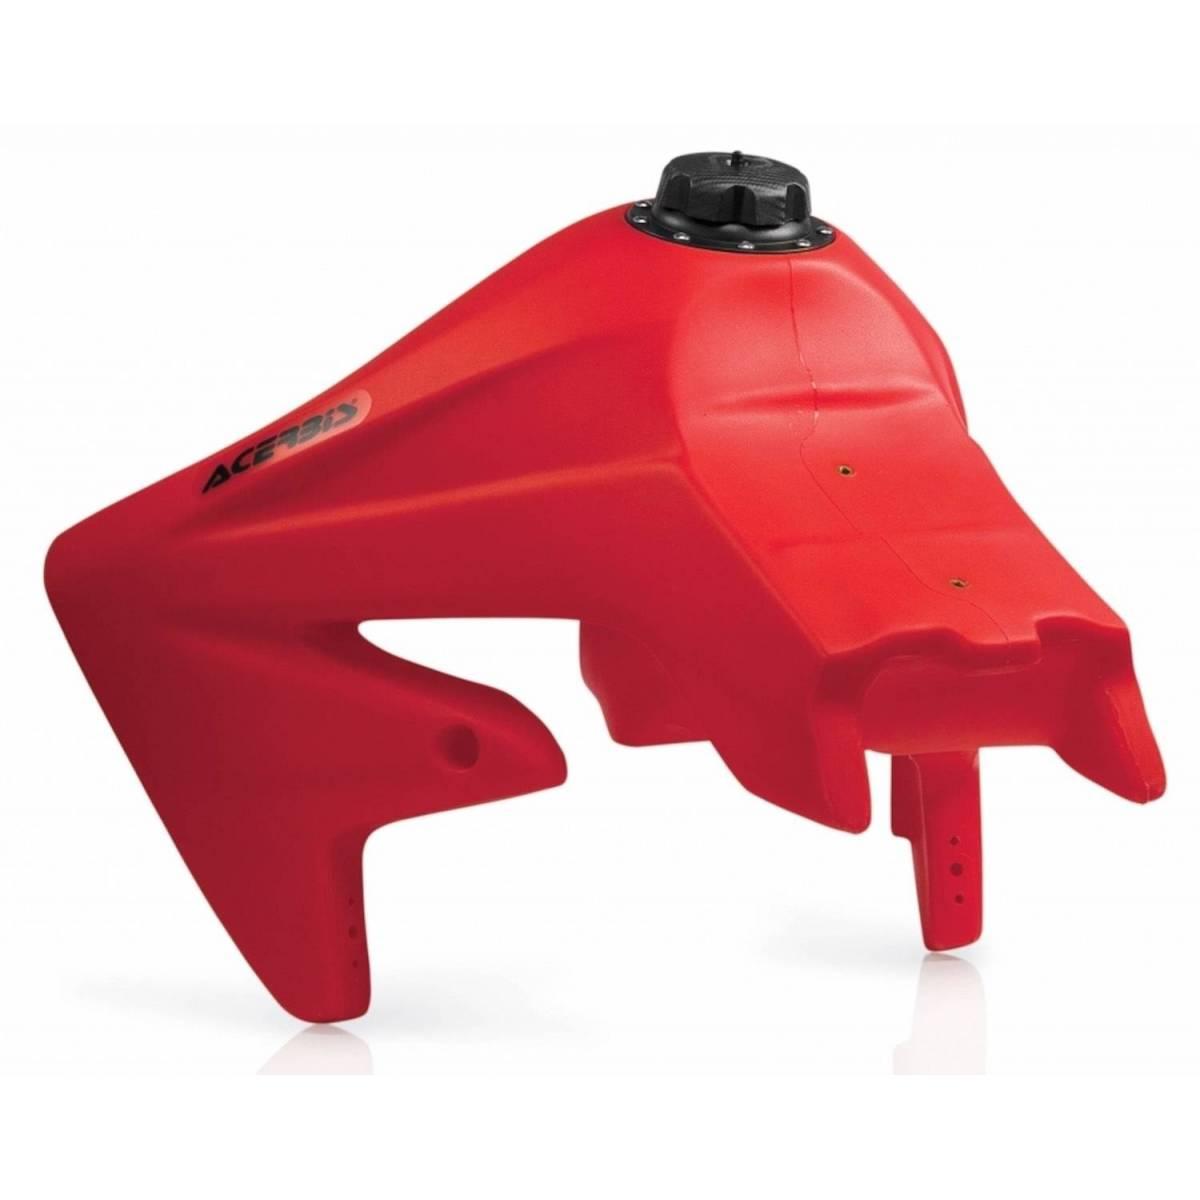 0010999-110 - Deposito Crf 450X 15.5L 05 16 Rojo